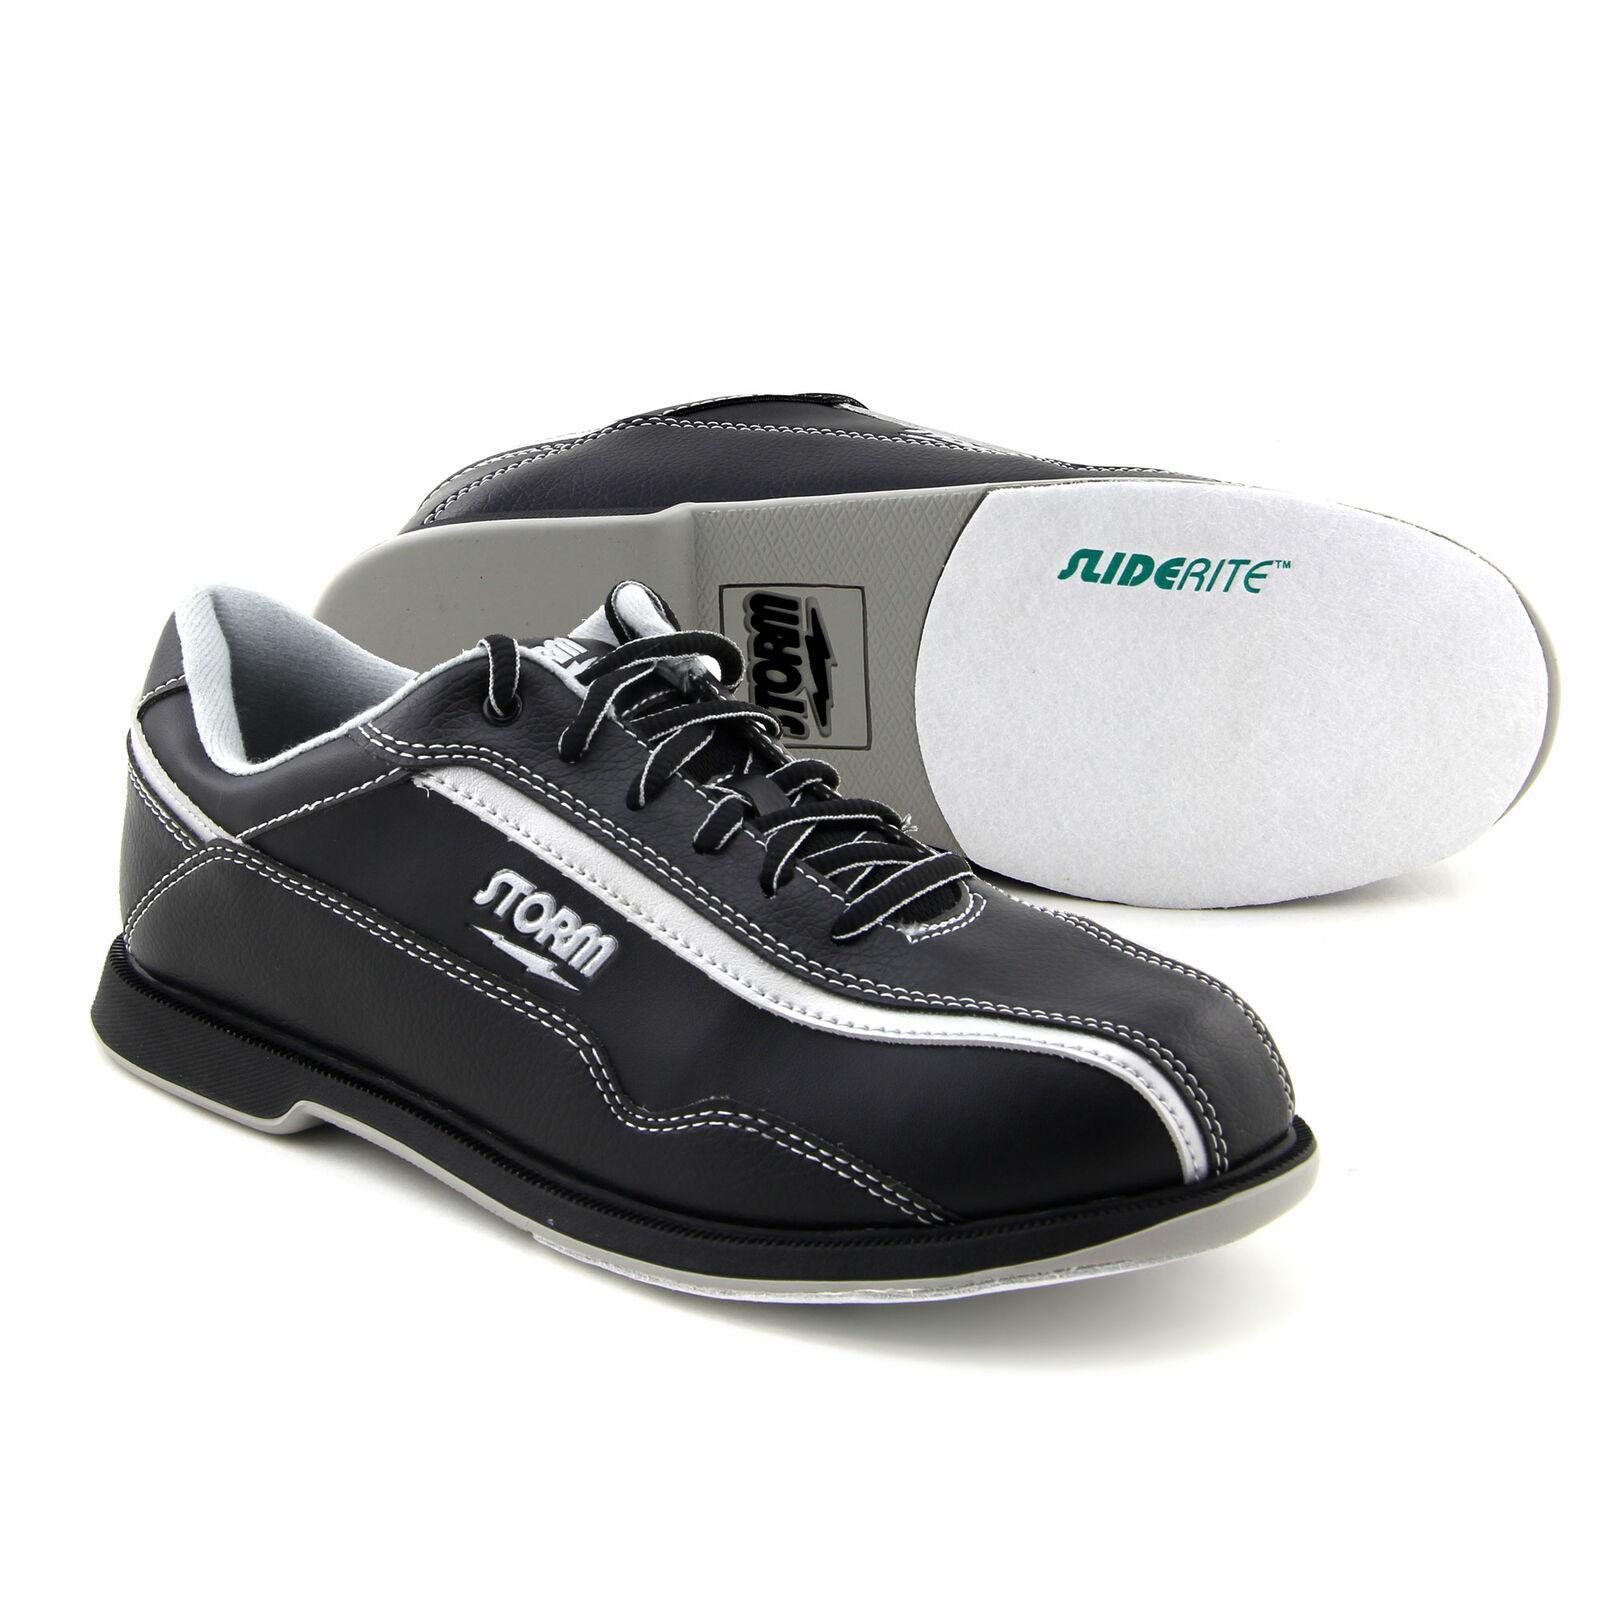 Men's Bowling Shoes storm Volkan Black Silver, Right & Lefth